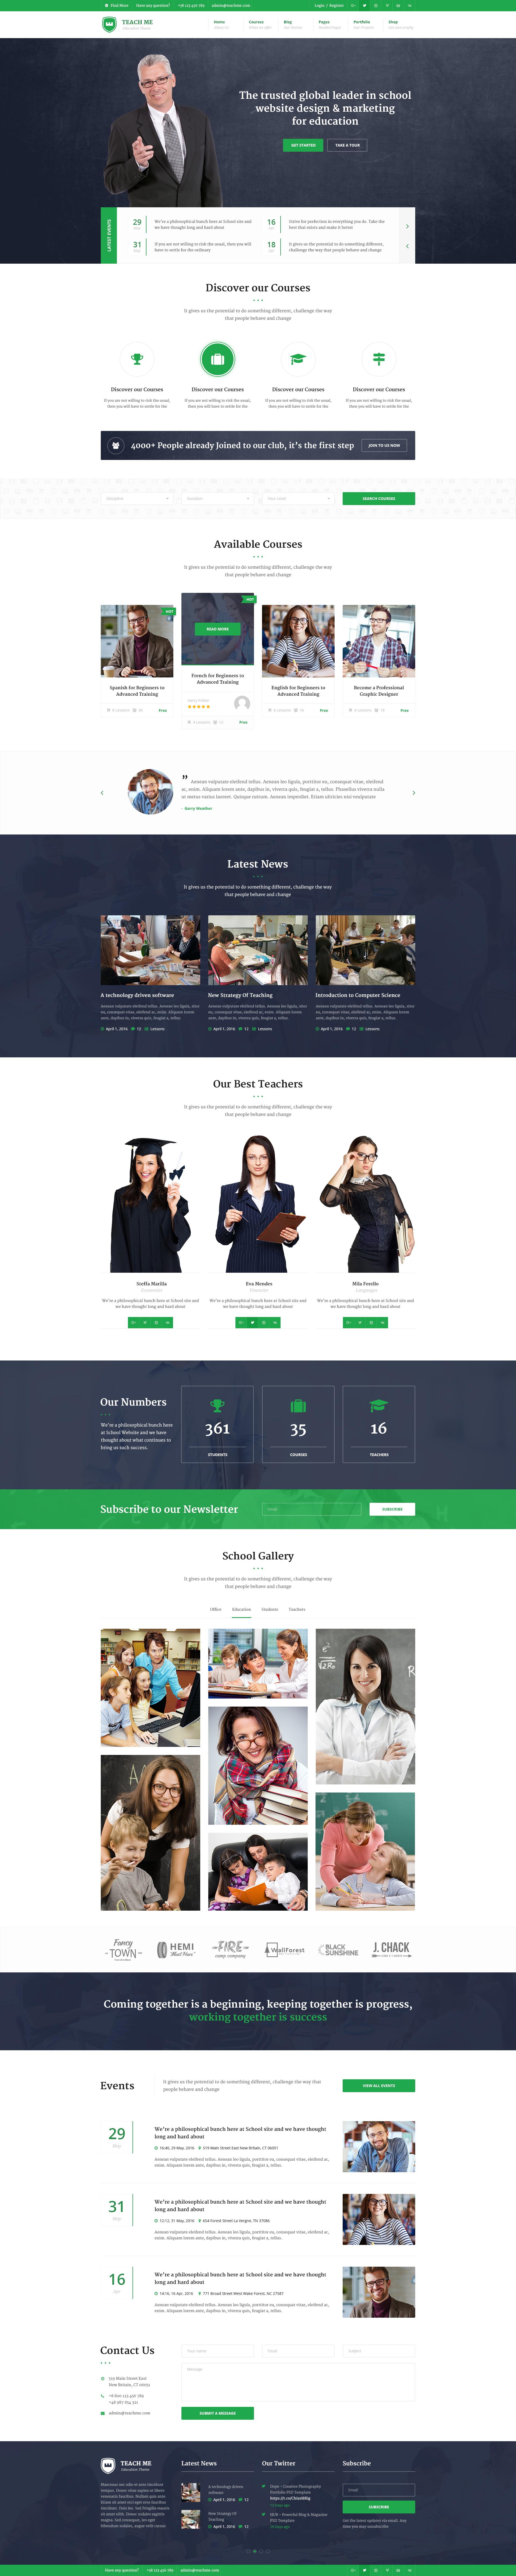 Thiết kế website trung tâm học trực tuyến